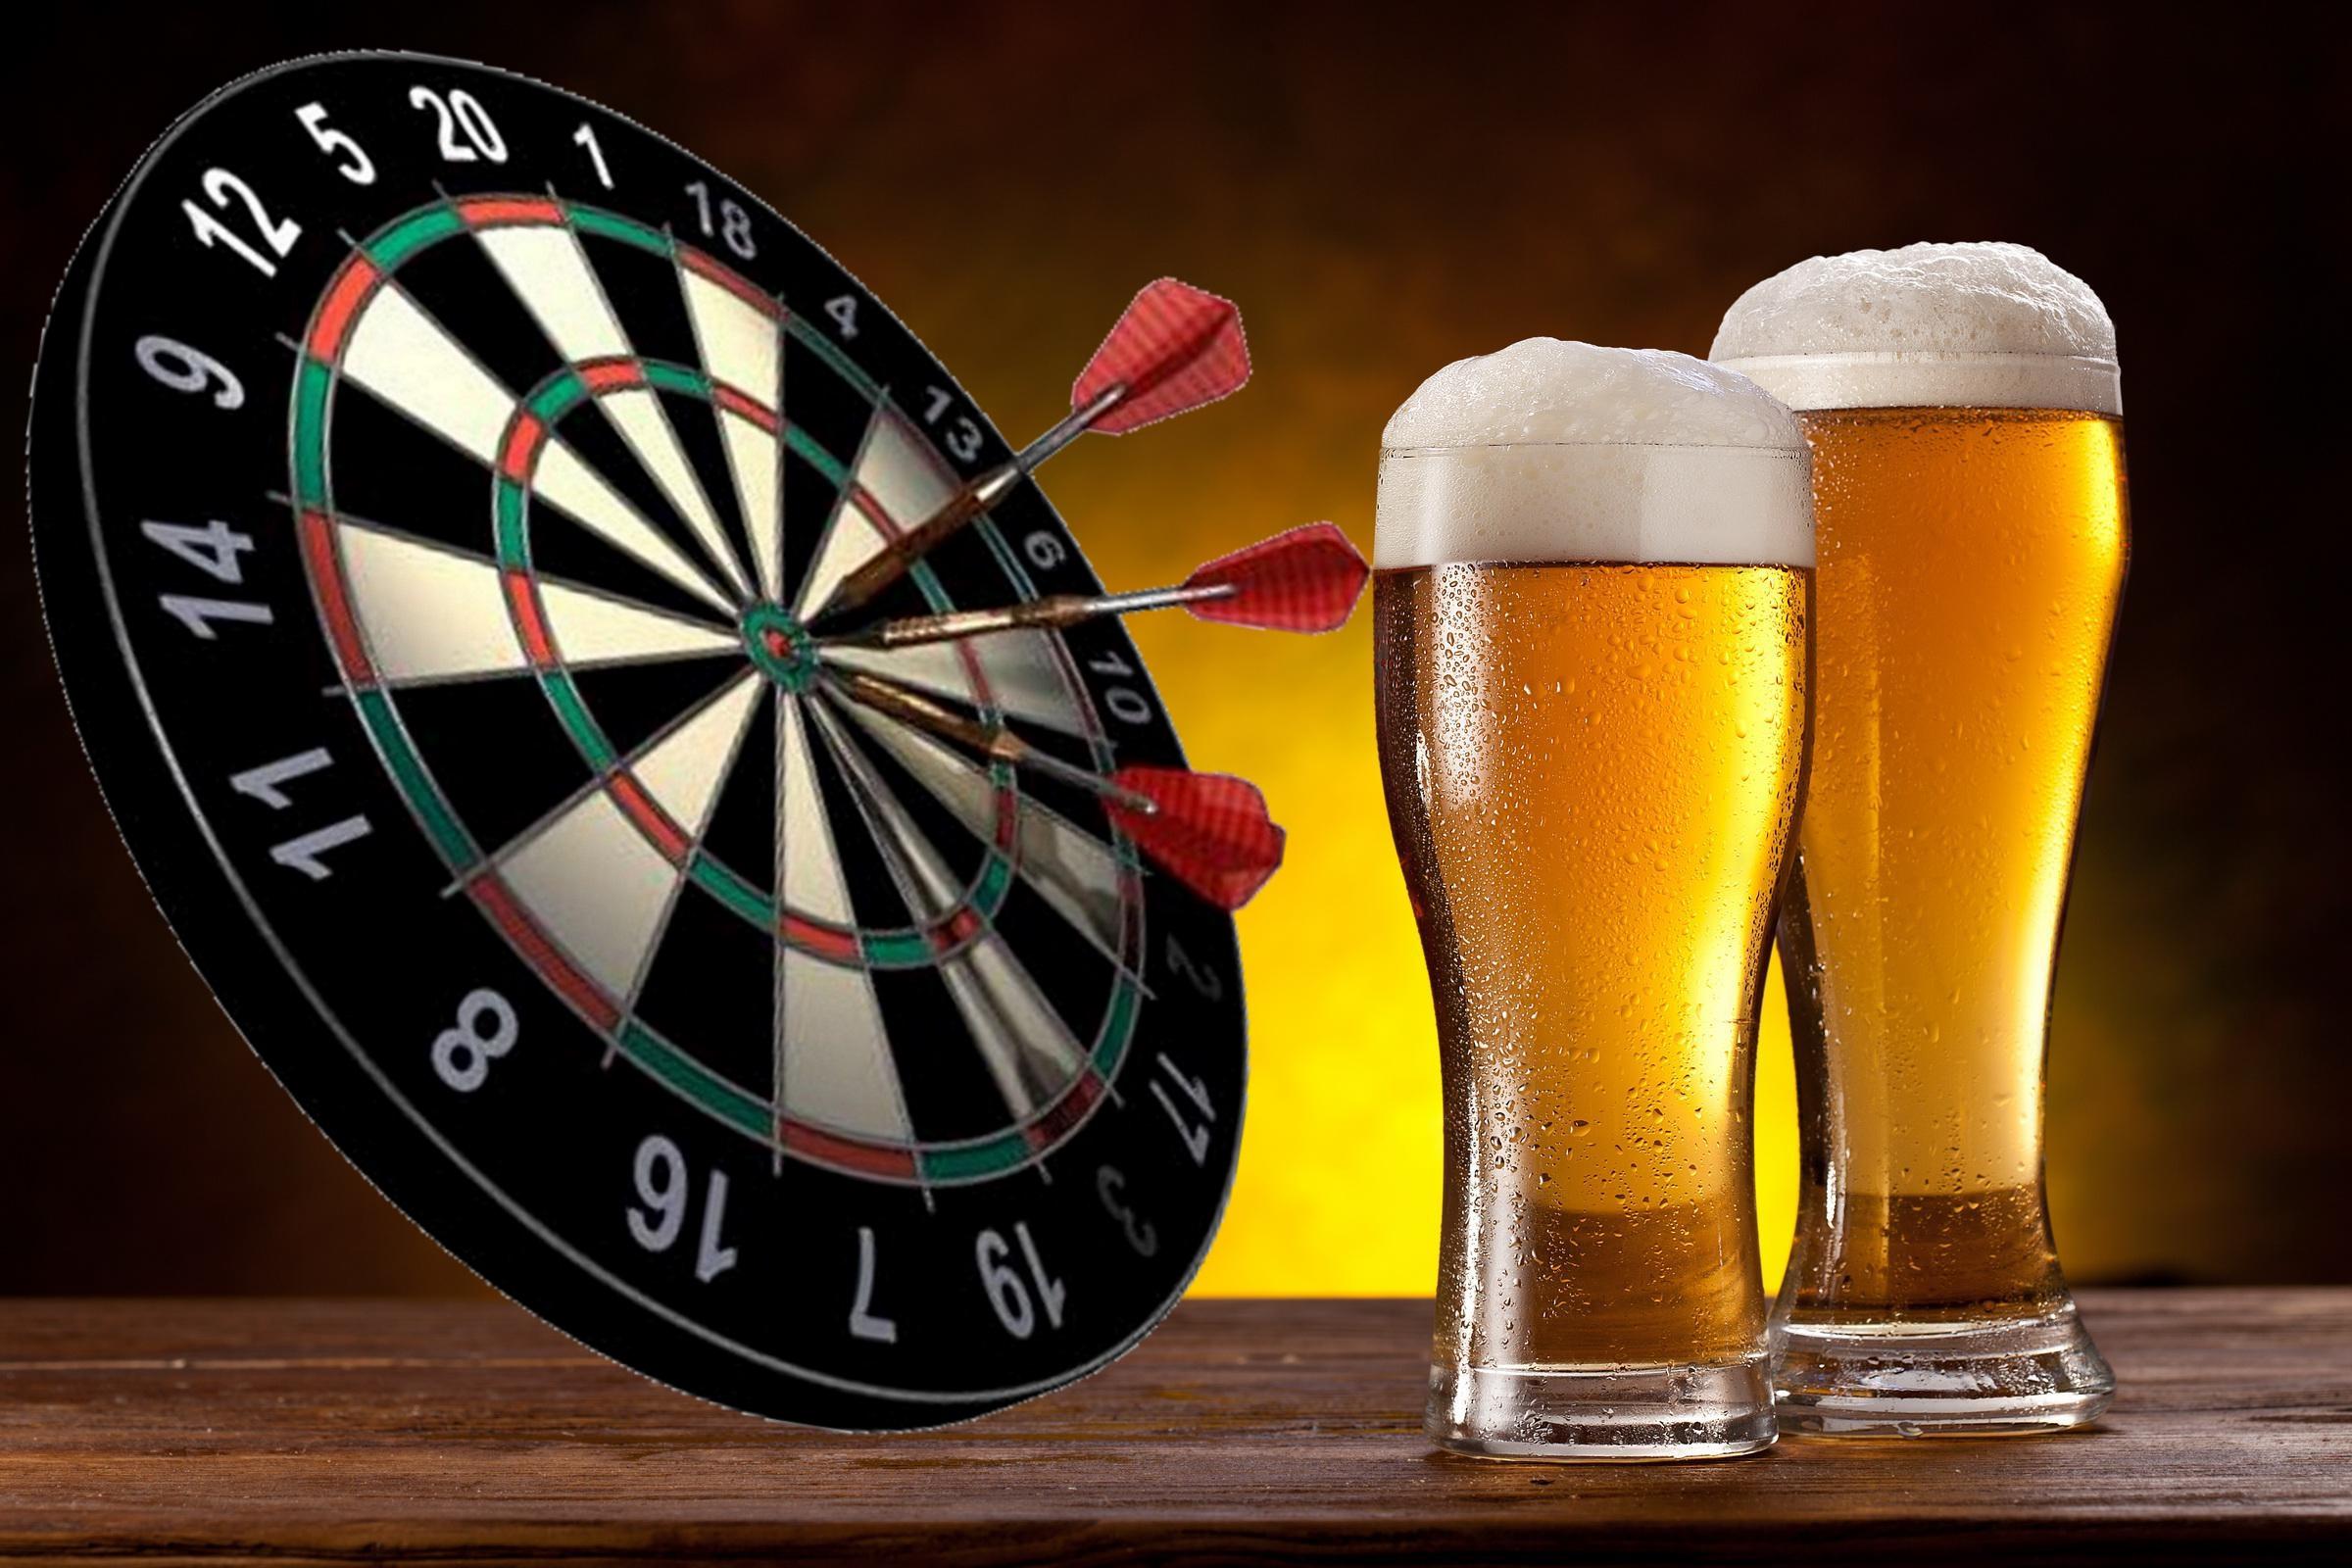 dartboard-and-beer1.jpg